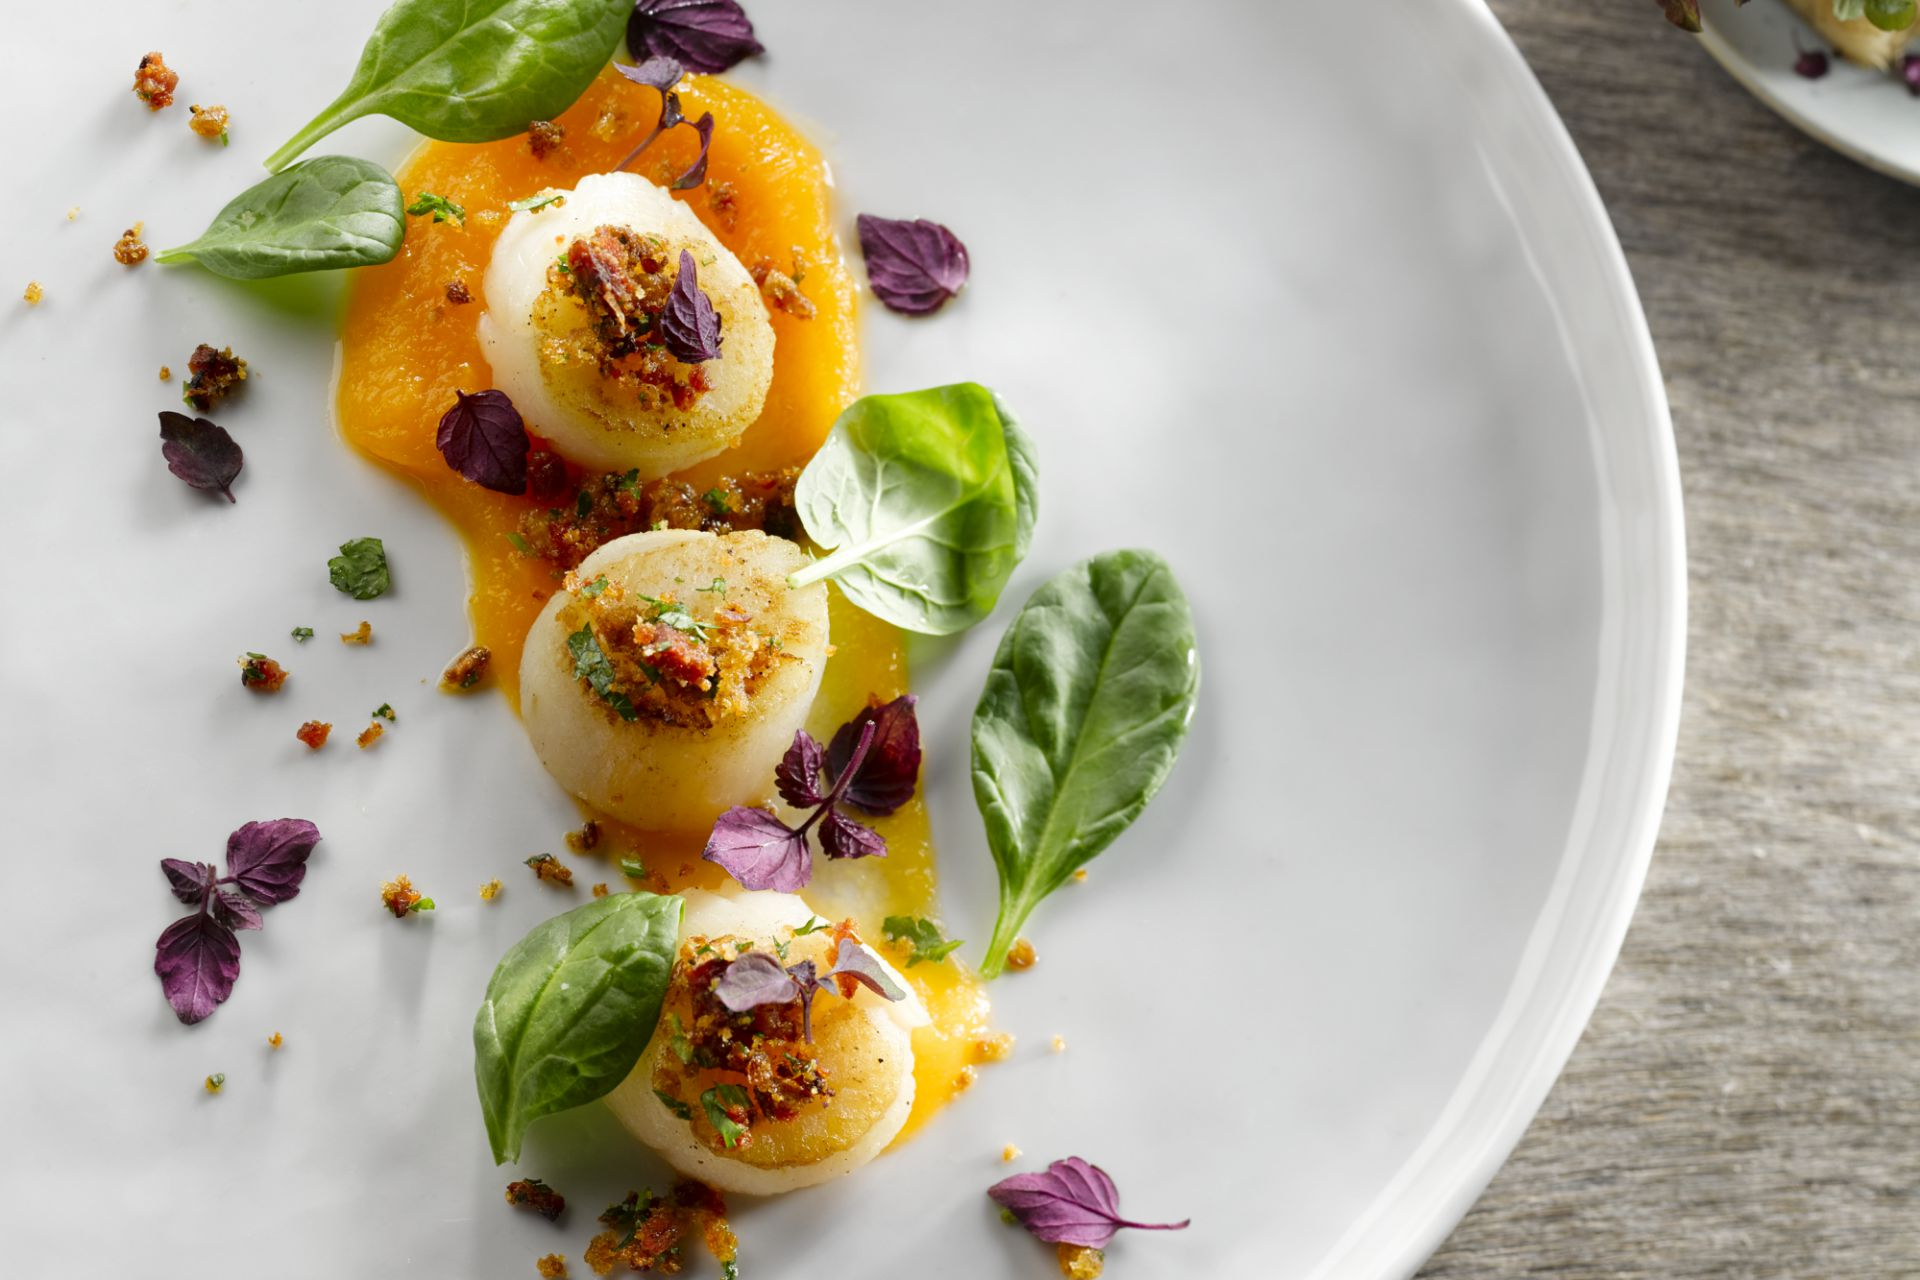 Sint-Jakobsvruchten met zalf van butternut en chorizocrunch